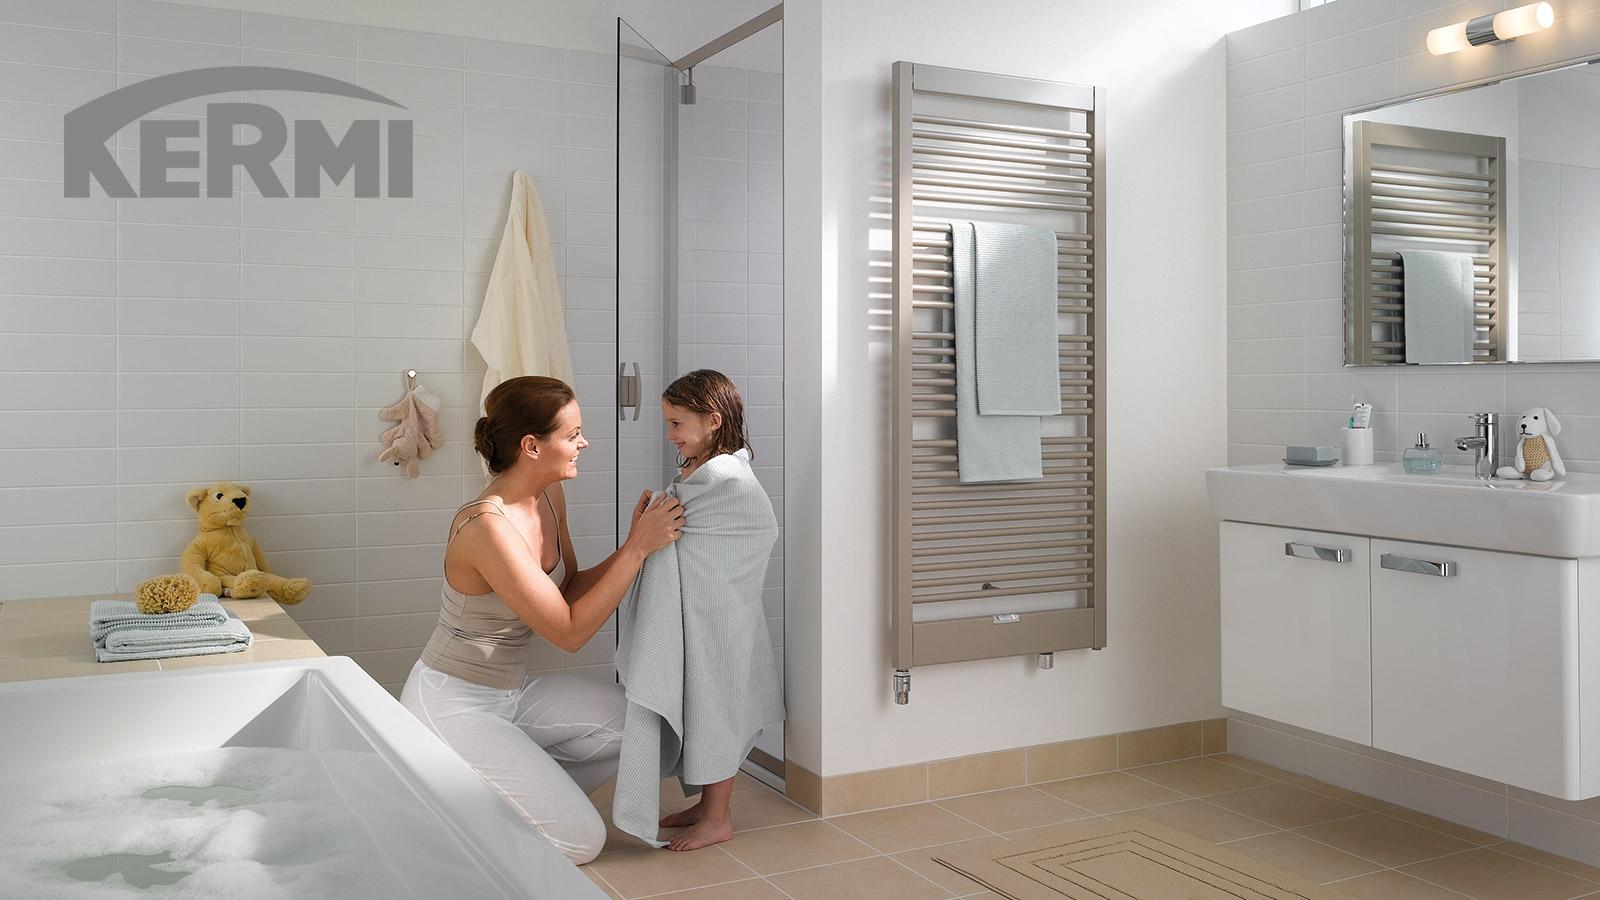 kermi badheizk rper design leistung w rme. Black Bedroom Furniture Sets. Home Design Ideas